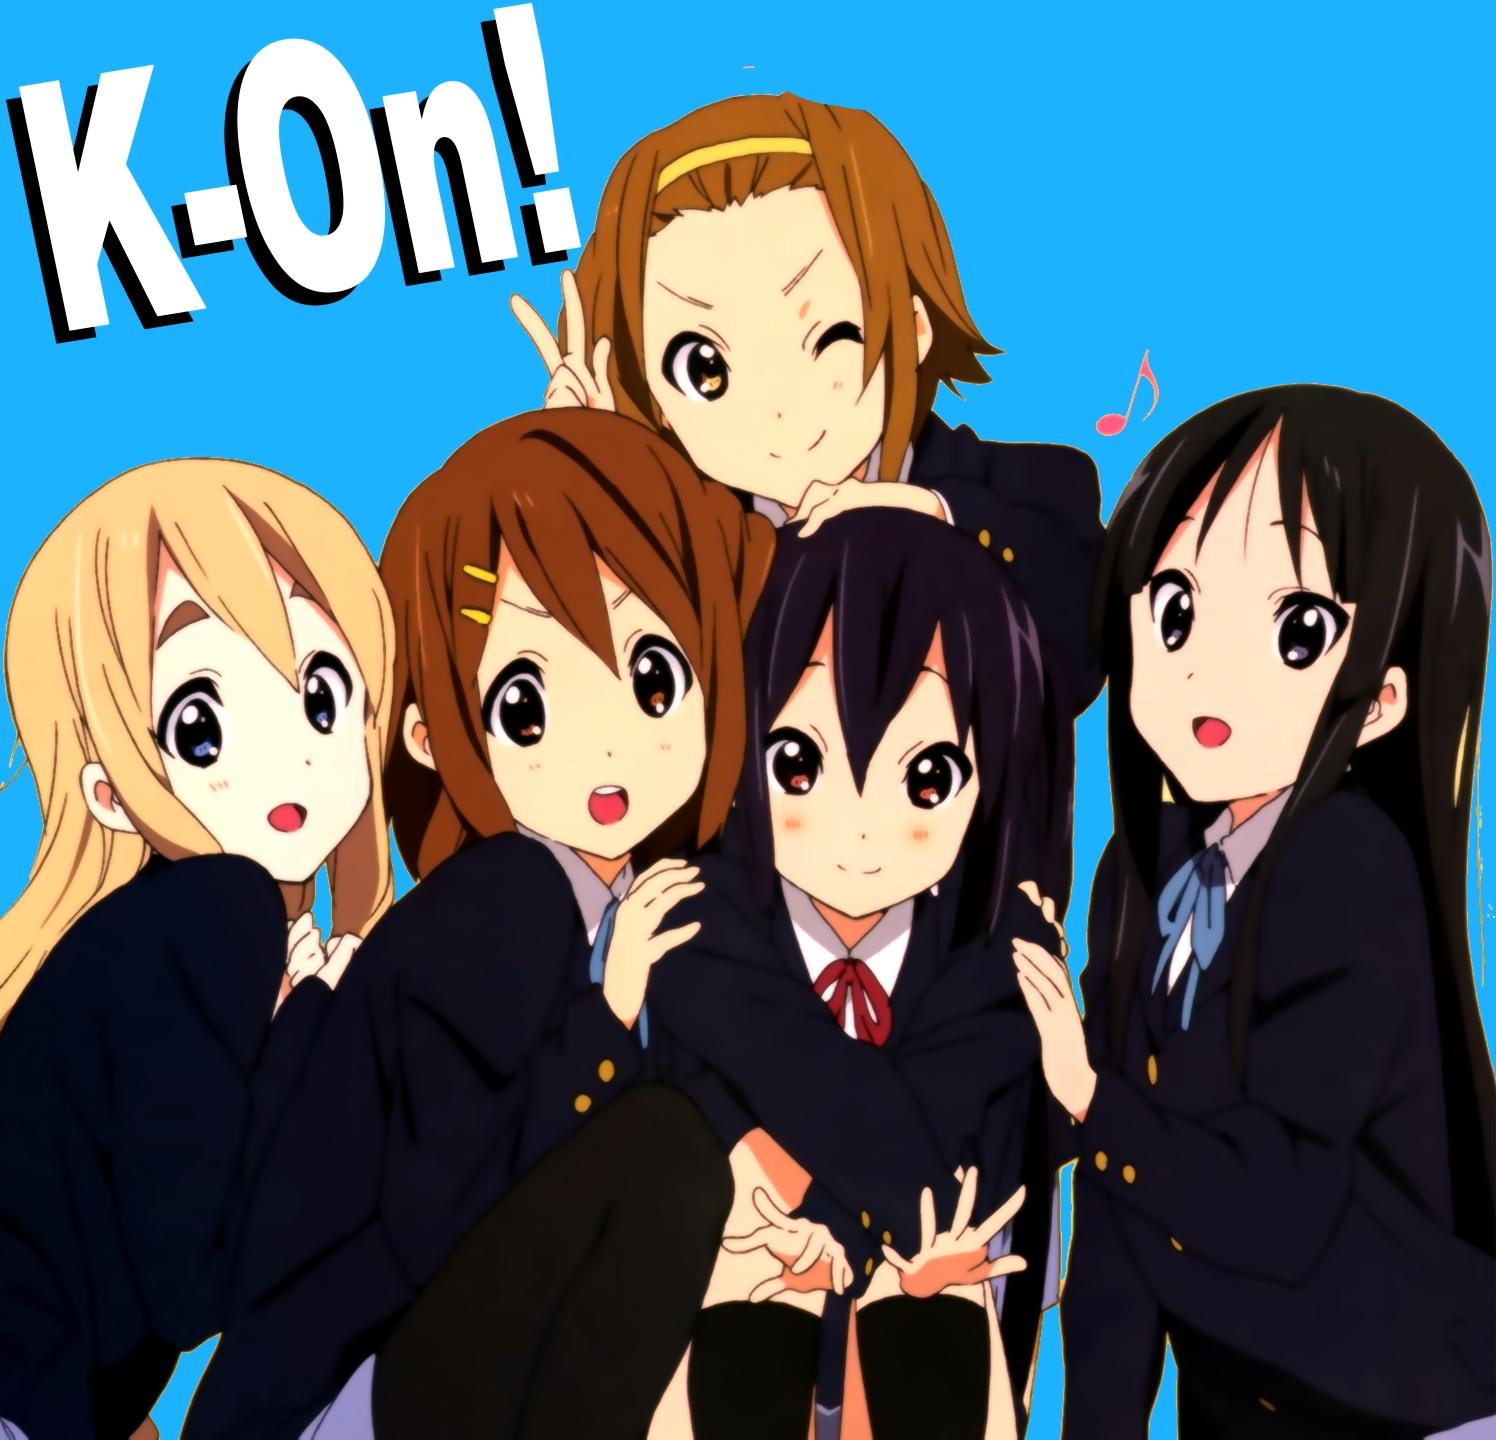 K-On! (Club de música ligera) K-On%2521